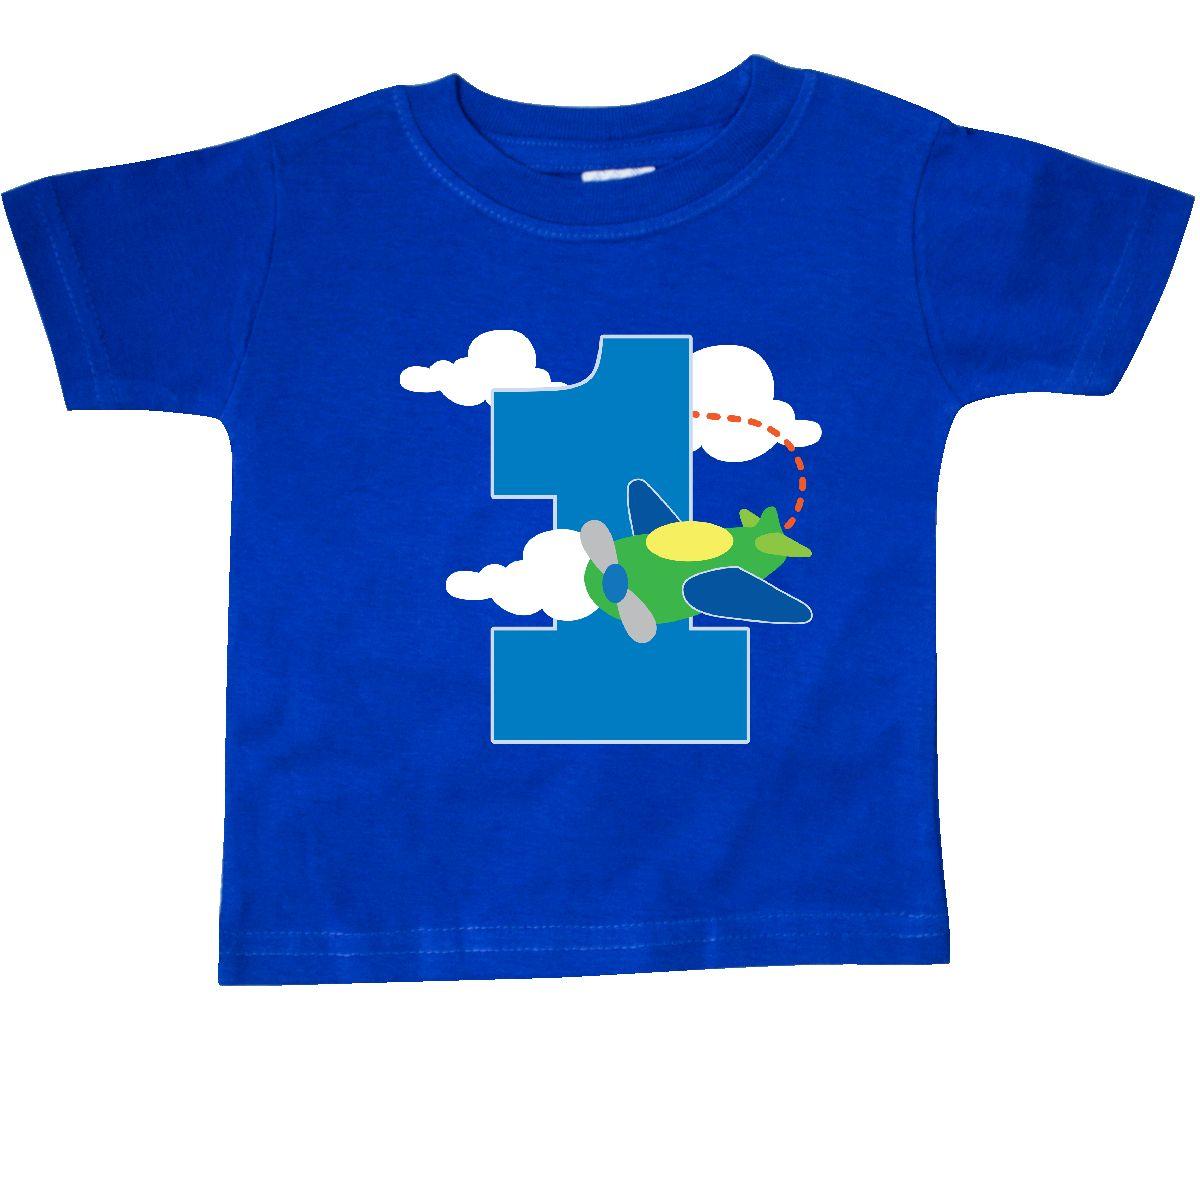 Birthday T Shirt For 1 Year Old Boy